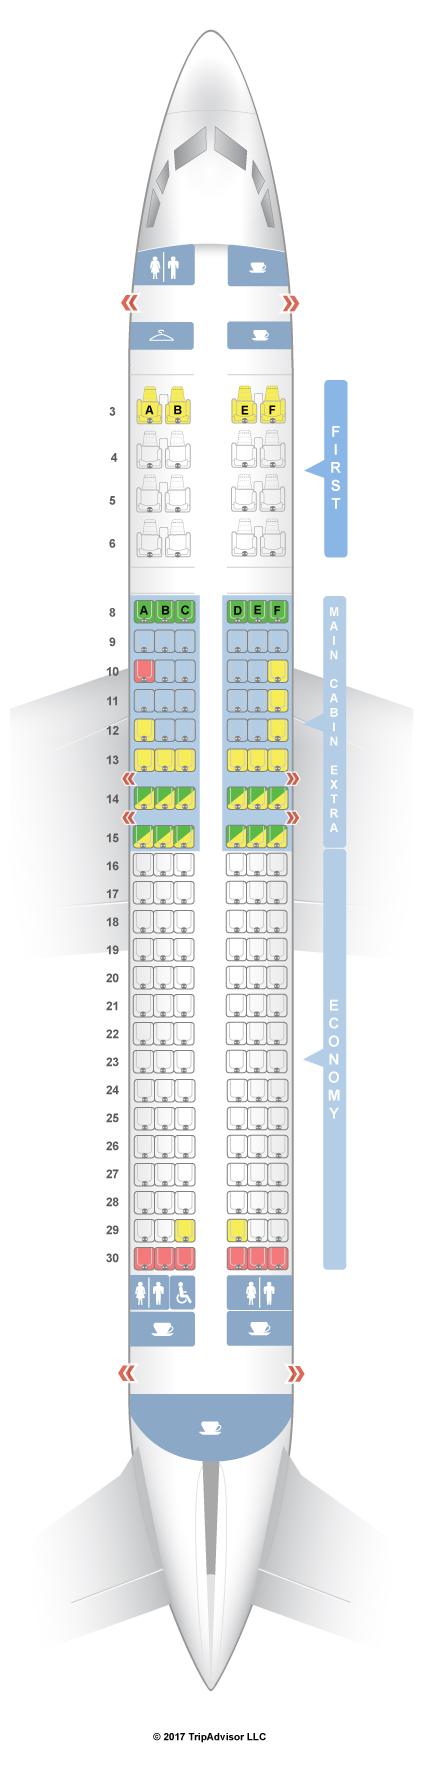 SeatGuru Seat Map American Airlines Boeing 737-800 (738) V1